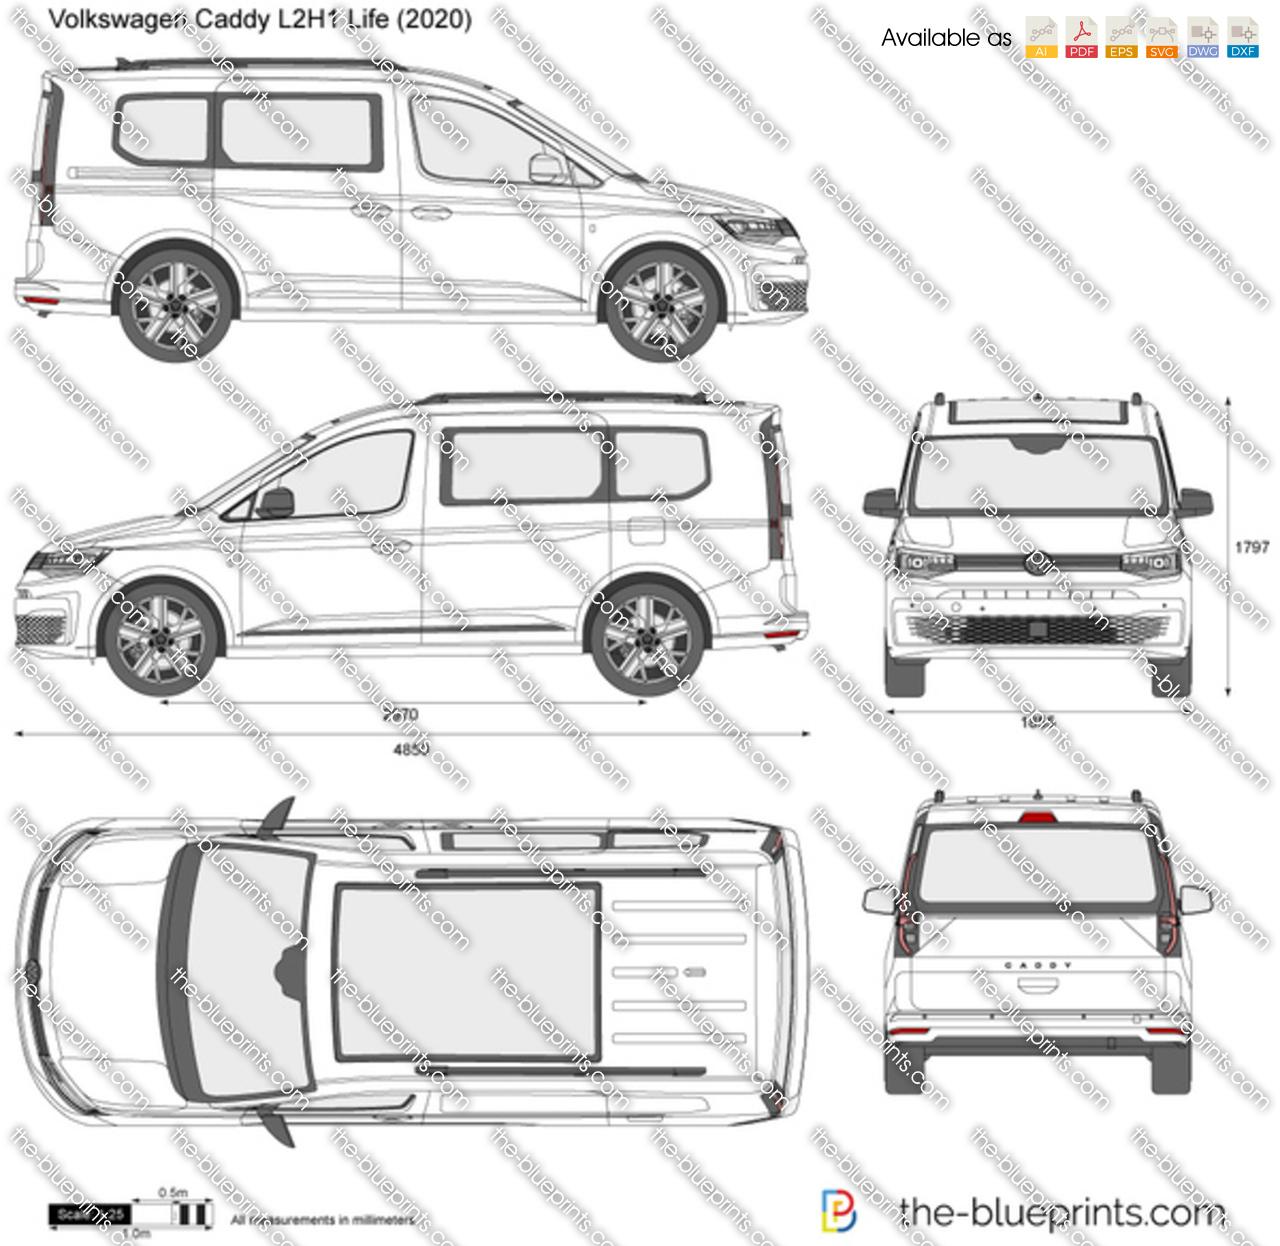 Volkswagen Caddy L2H1 Life